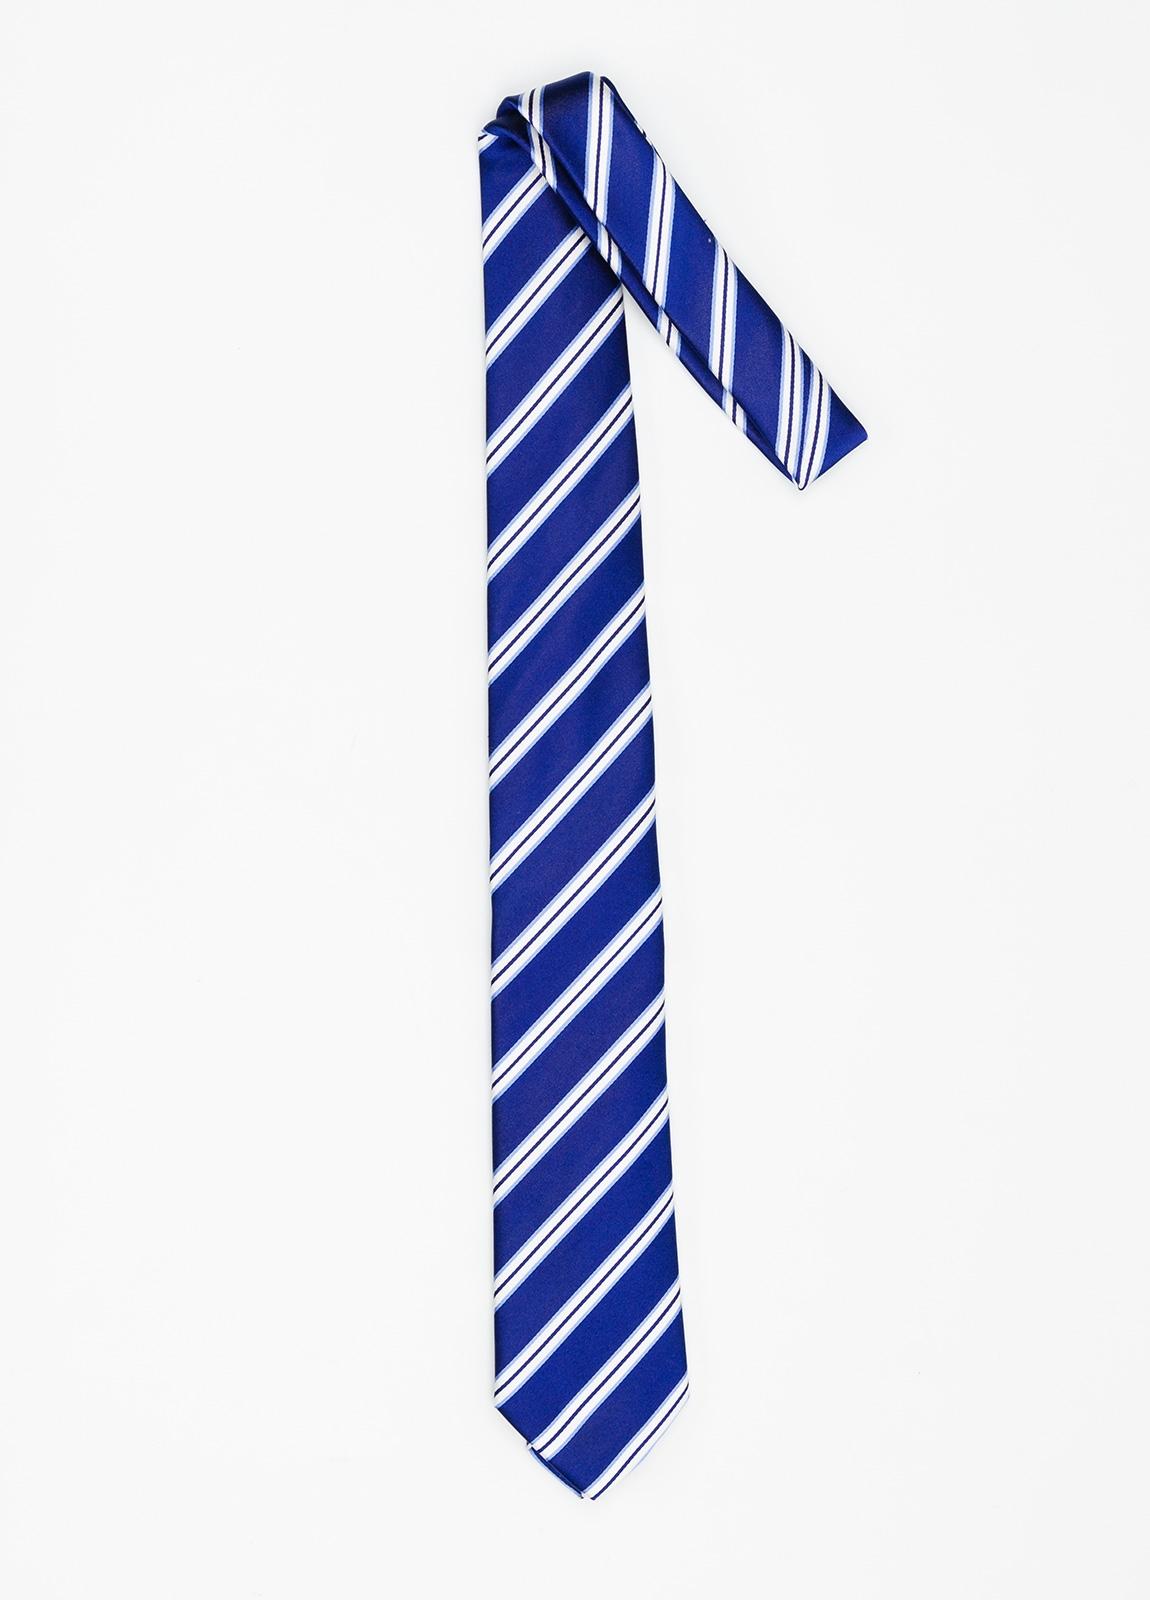 Corbata Formal Wear rayas en diagonal color azulón. Pala 7,5 cm. 100% Seda. - Ítem1